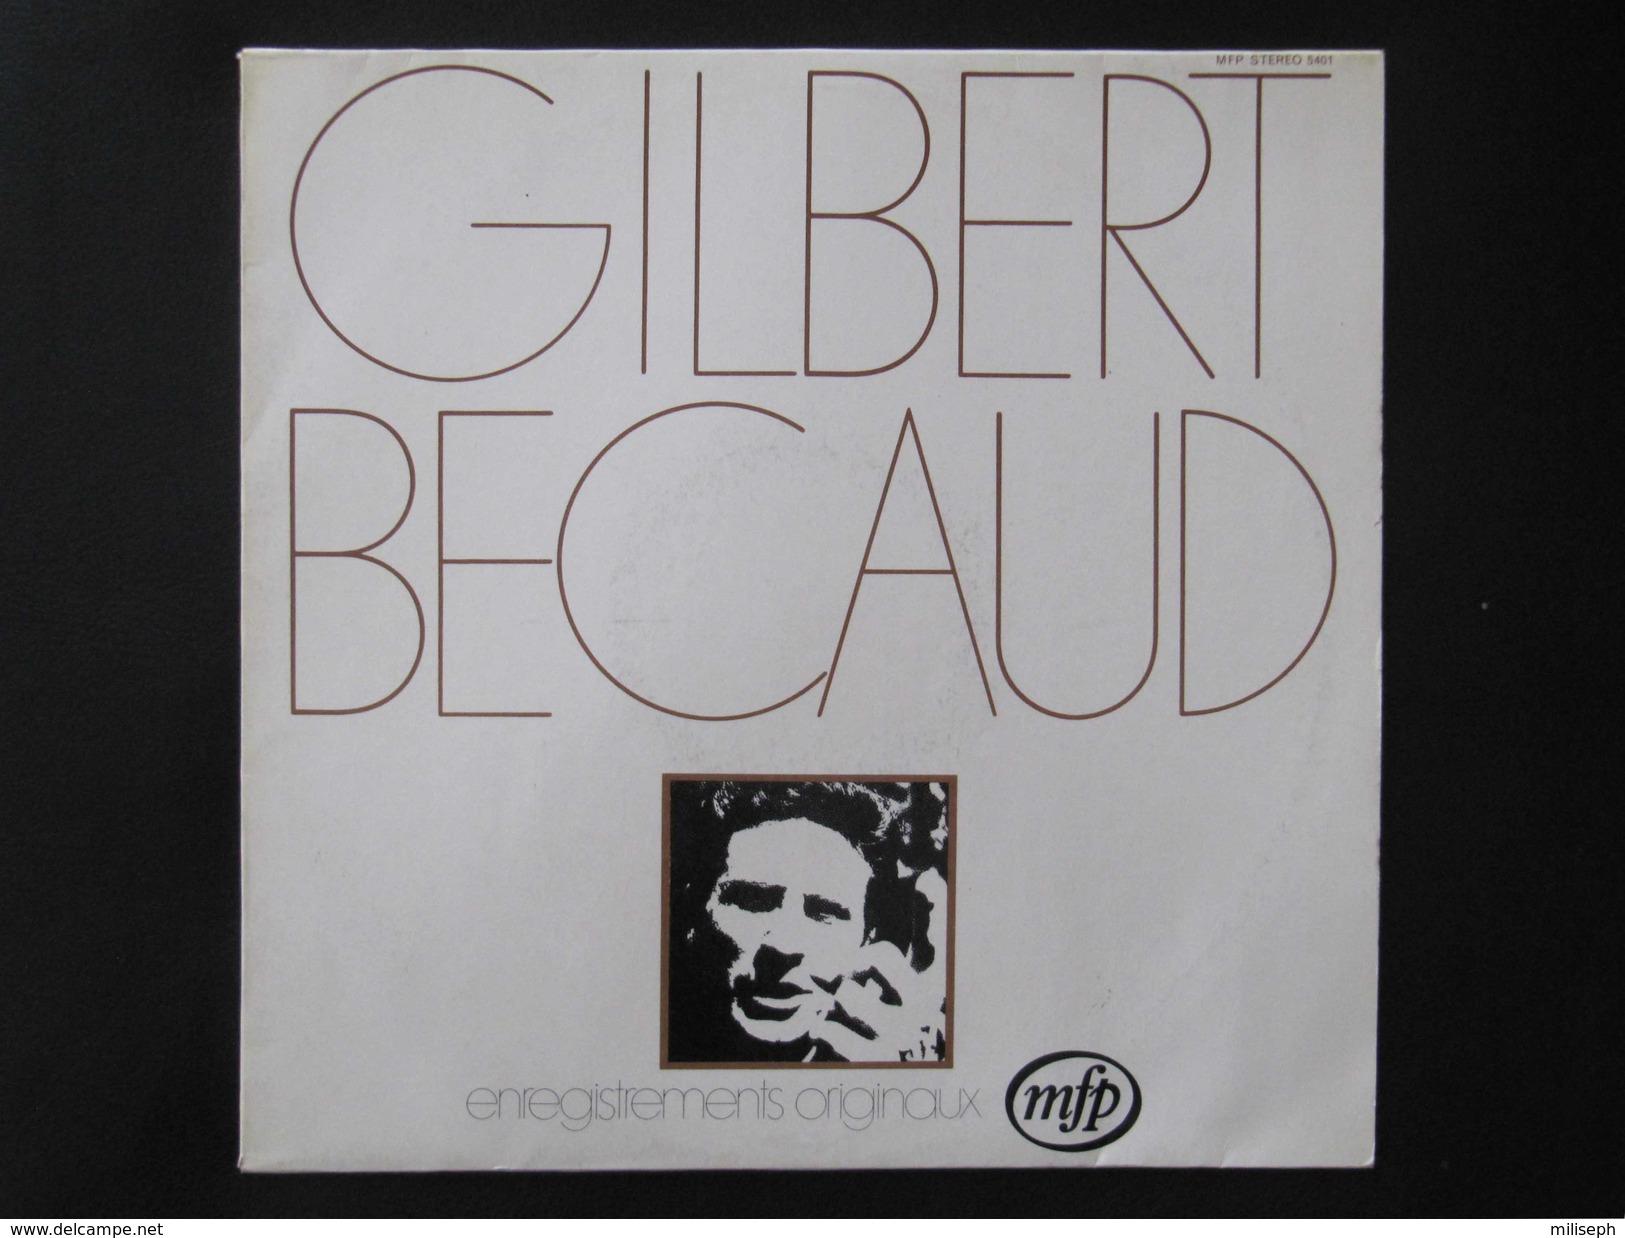 Disque 33 T - GILBERT BECAUD - Enregistrements Originaux - 1971  (4303) - Vinyles